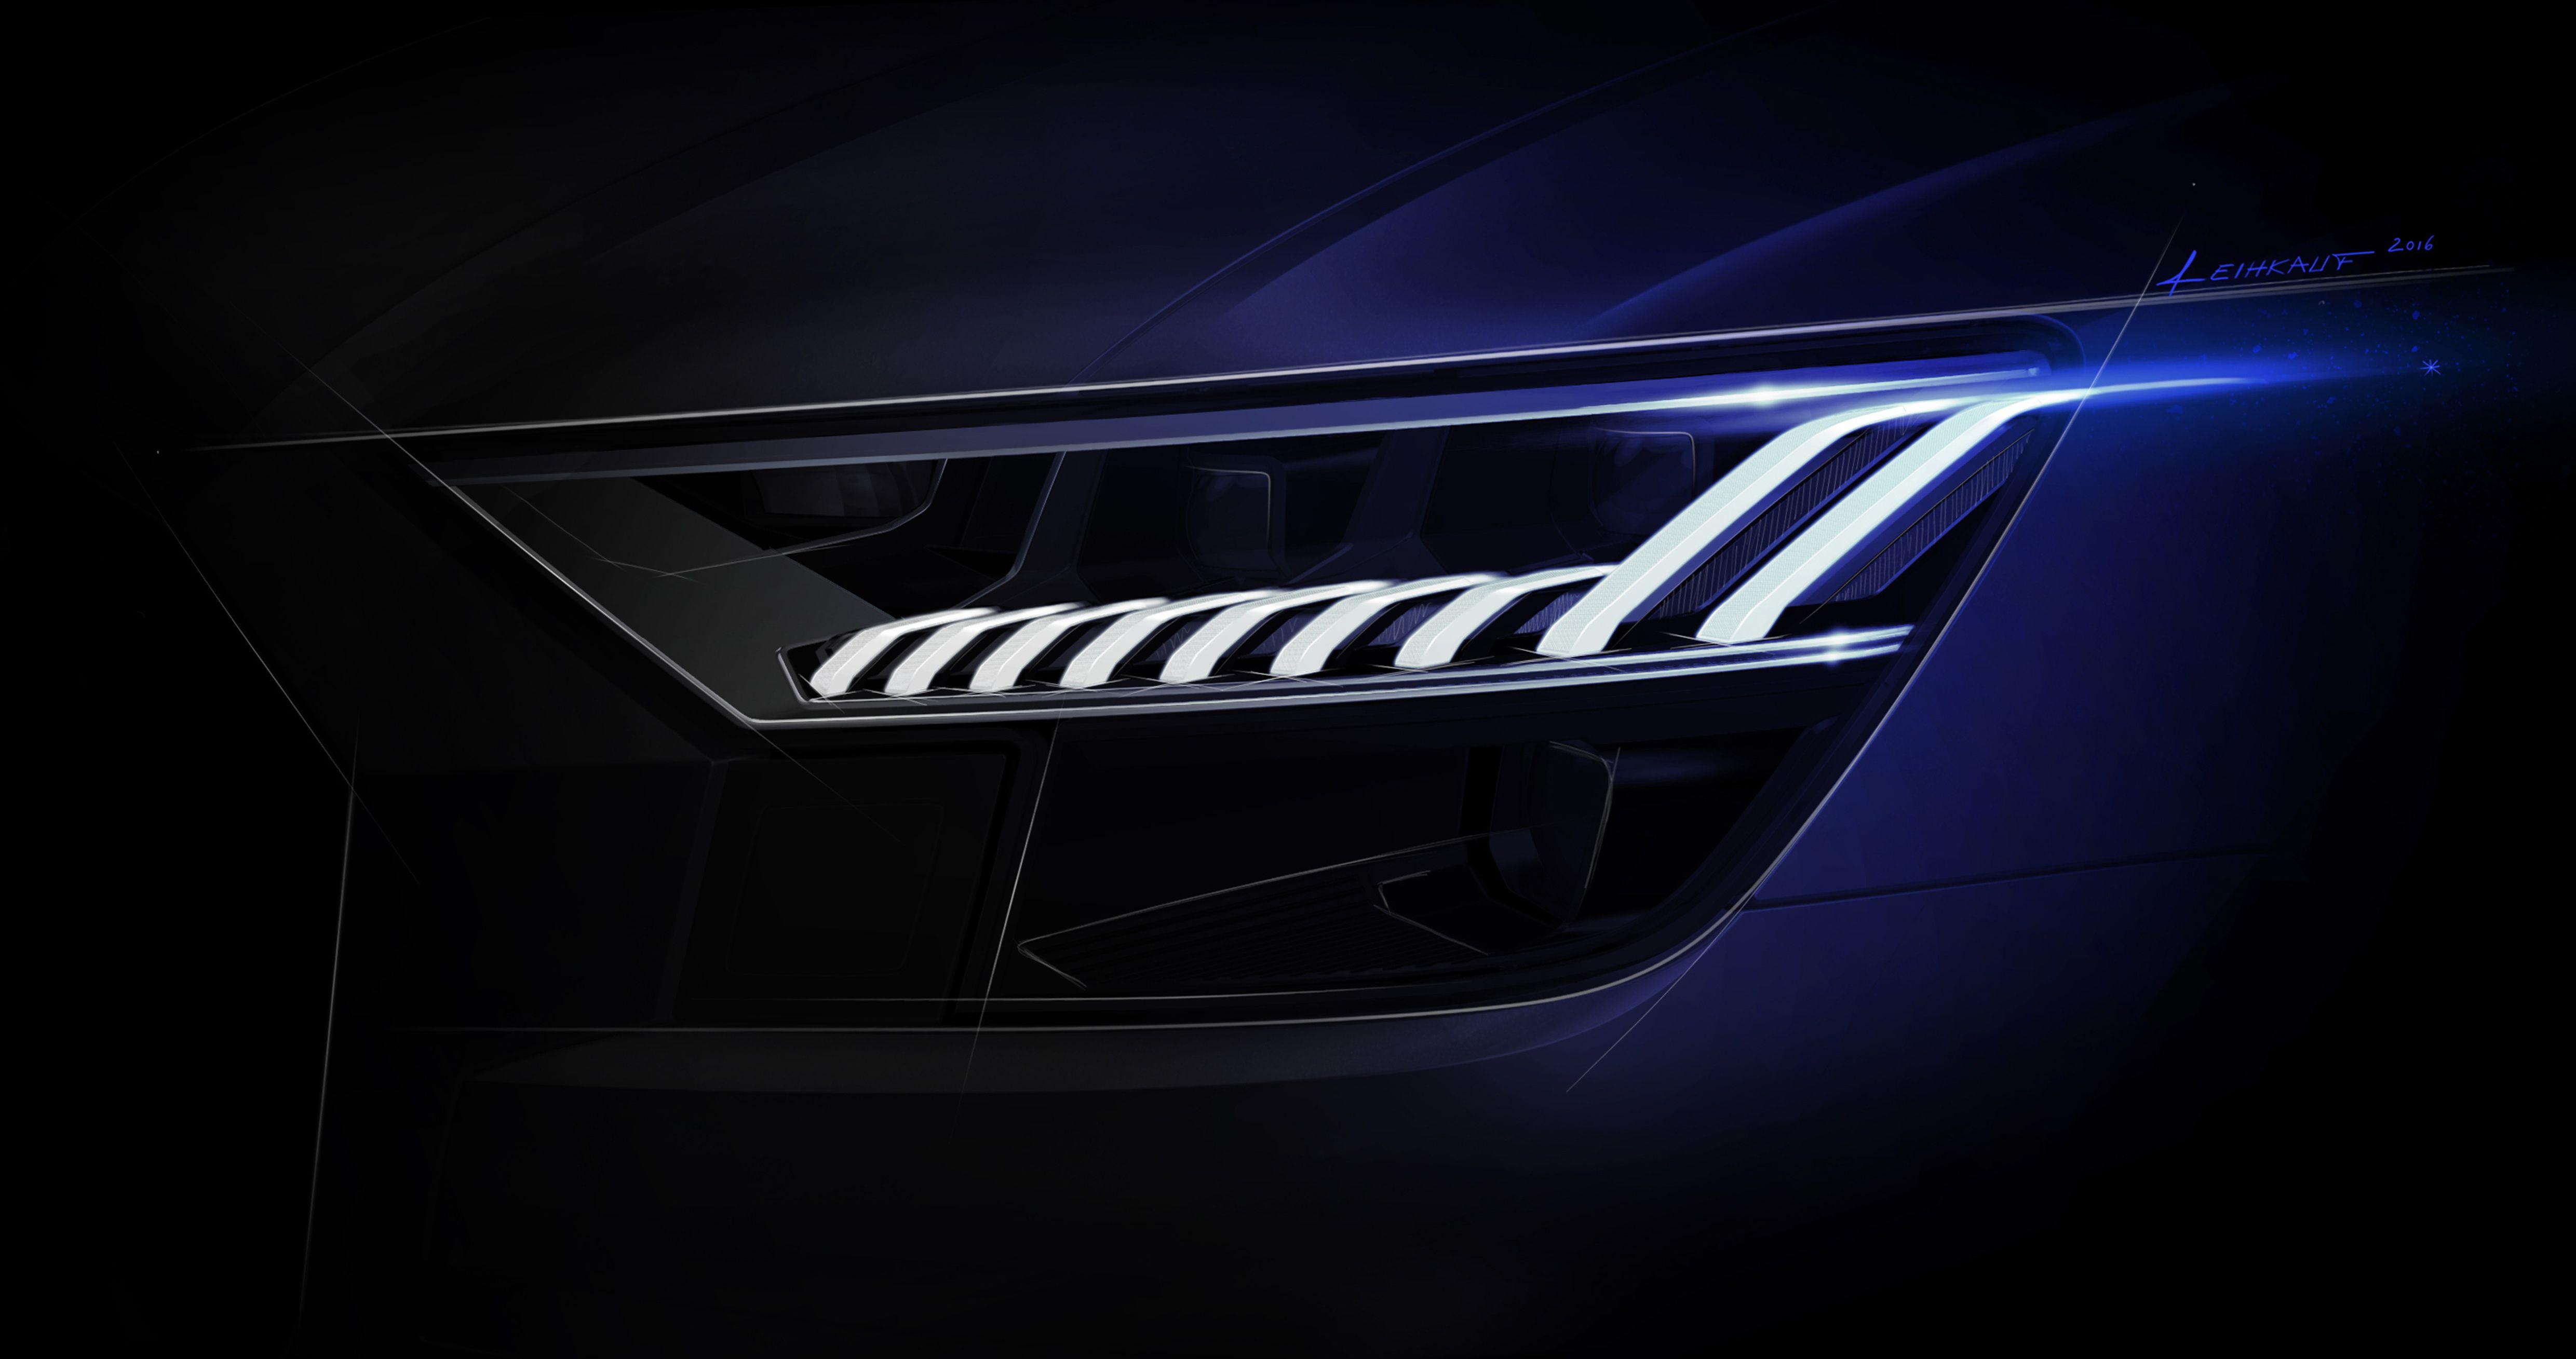 Audi Q8 Headlight Design Car Light Audi Cars Design